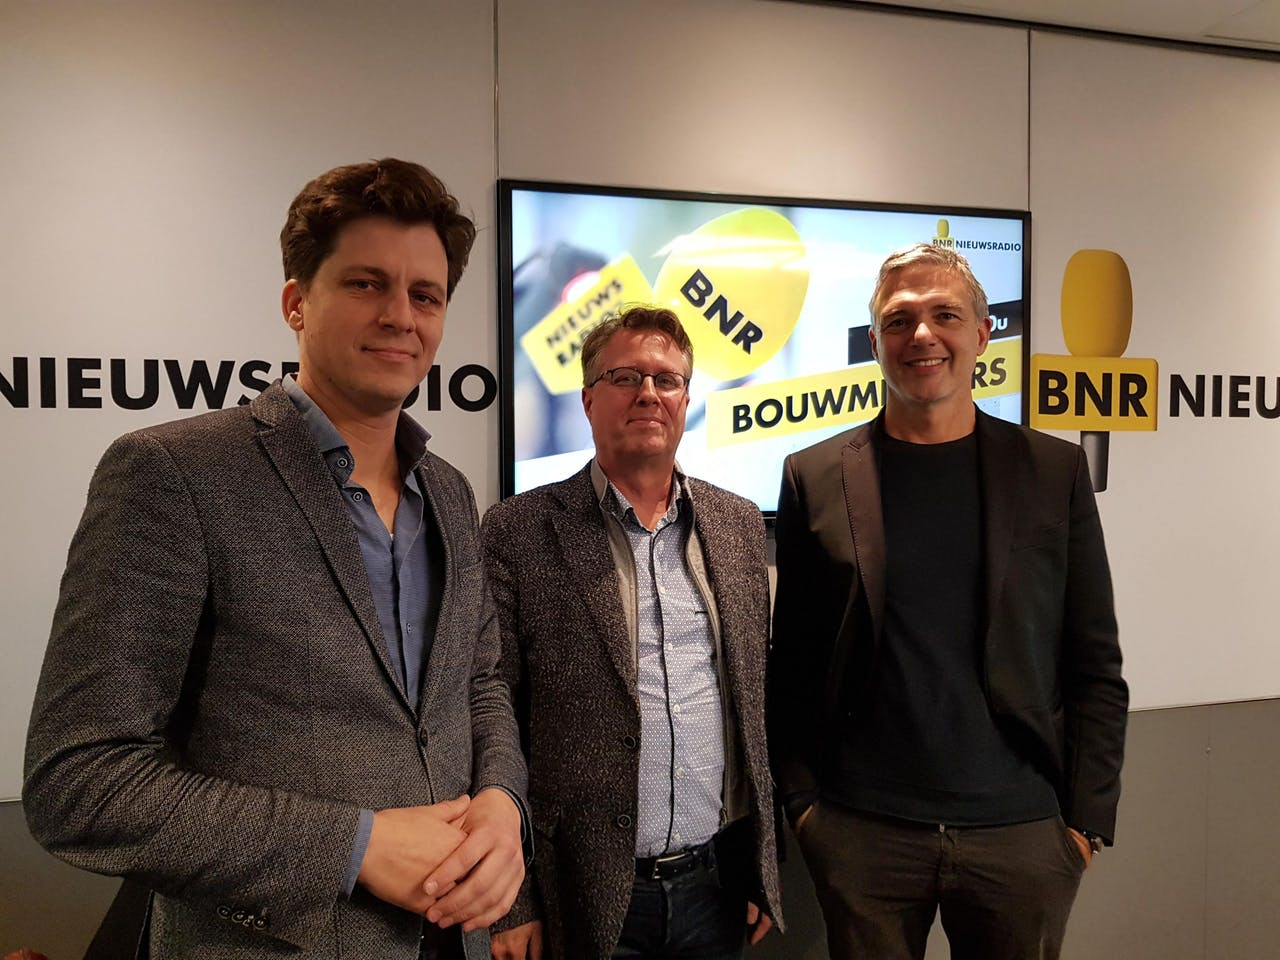 V.l.n.r.: Friso Klapwijk, Erik Steegman en Paul Laseur